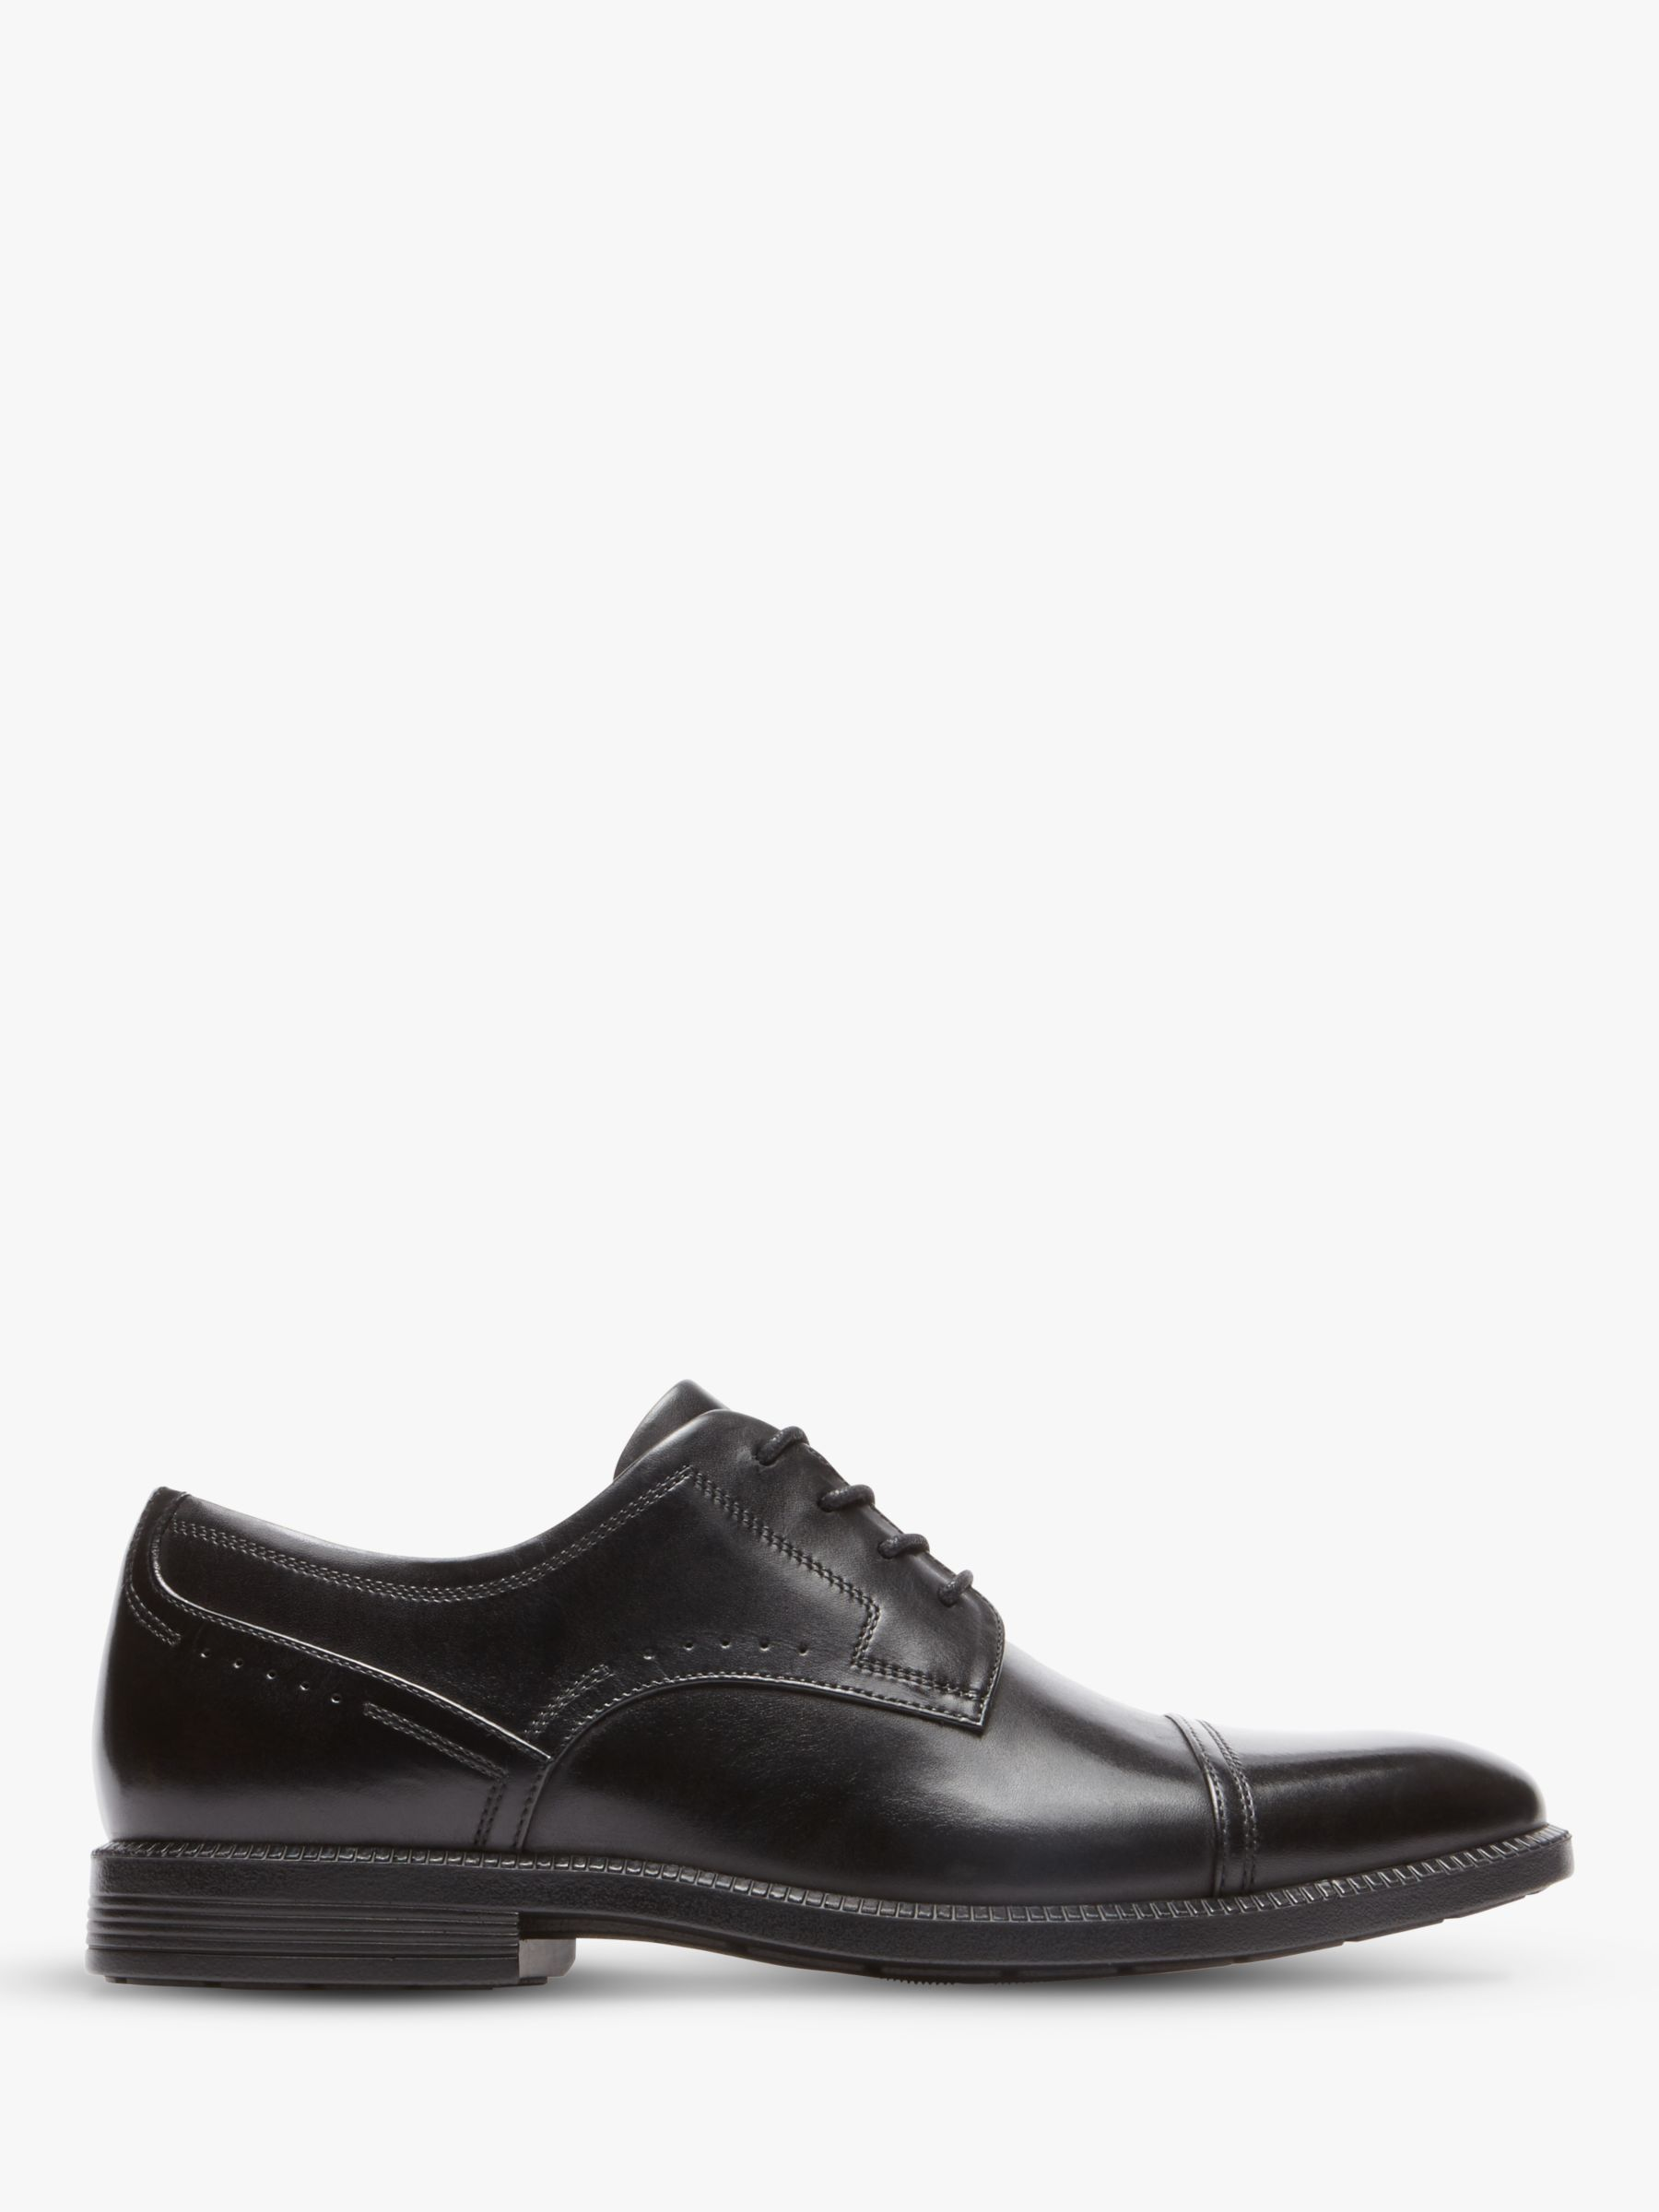 Rockport Rockport Dressport Toecap Shoes, Black